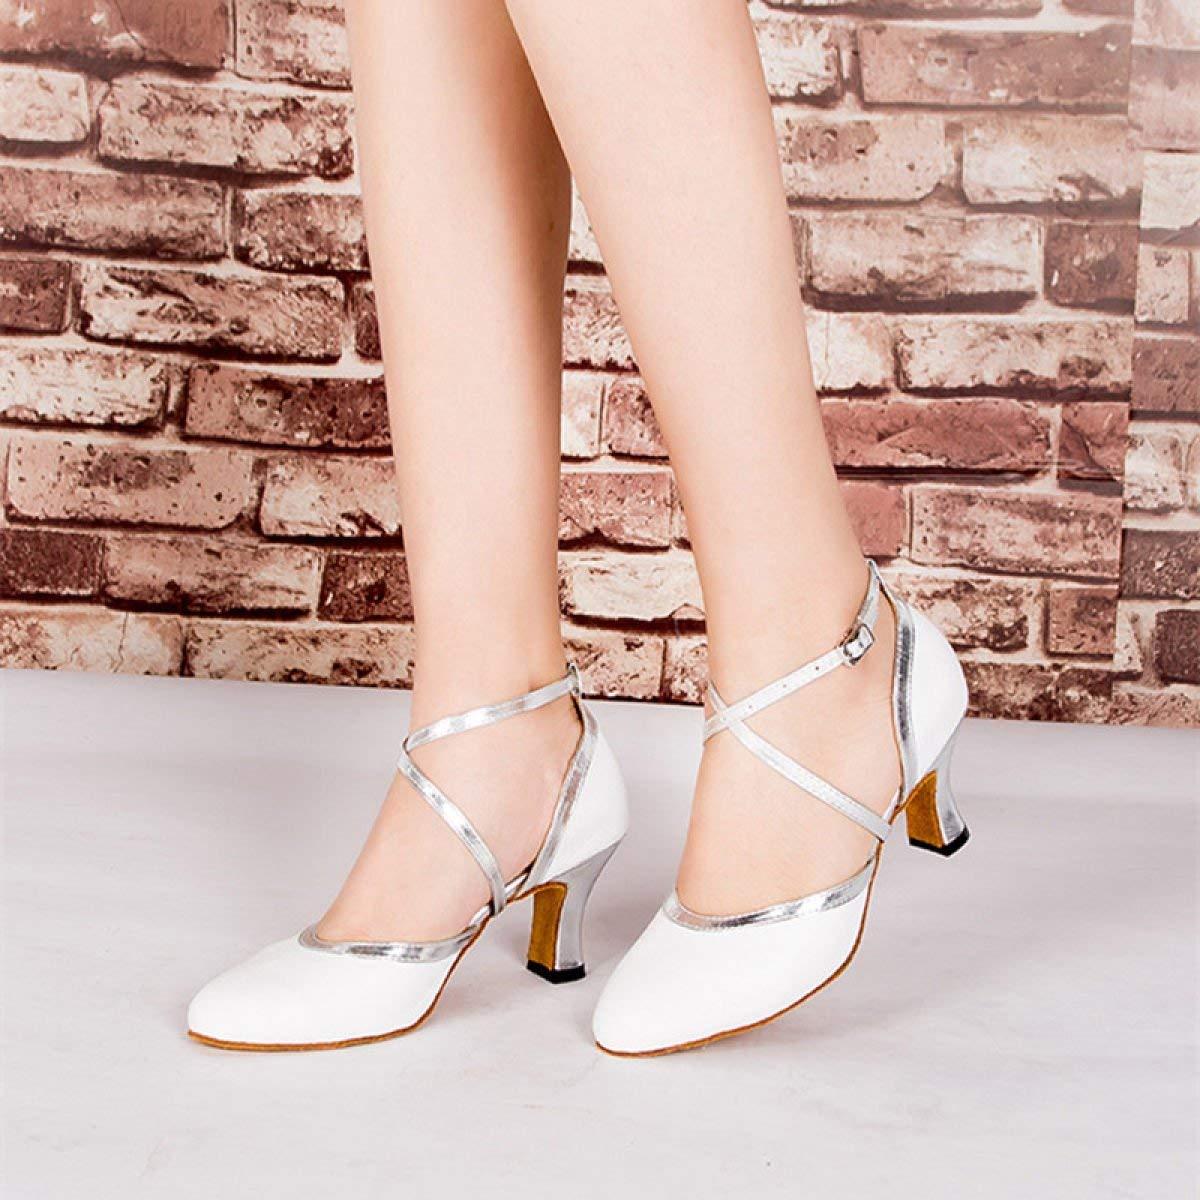 Damen Latin Dance Closed Toe Toe Toe High Heel UP Leder Glitter Salsa Tango Moderne Ballrom Mary Jance Tanzschuhe WeißHeeled6cm-UK5.5   EU38   Our39 (Farbe   Weißheeled8cm Größe   UK4.5 EU36 Our37) 69f1a2